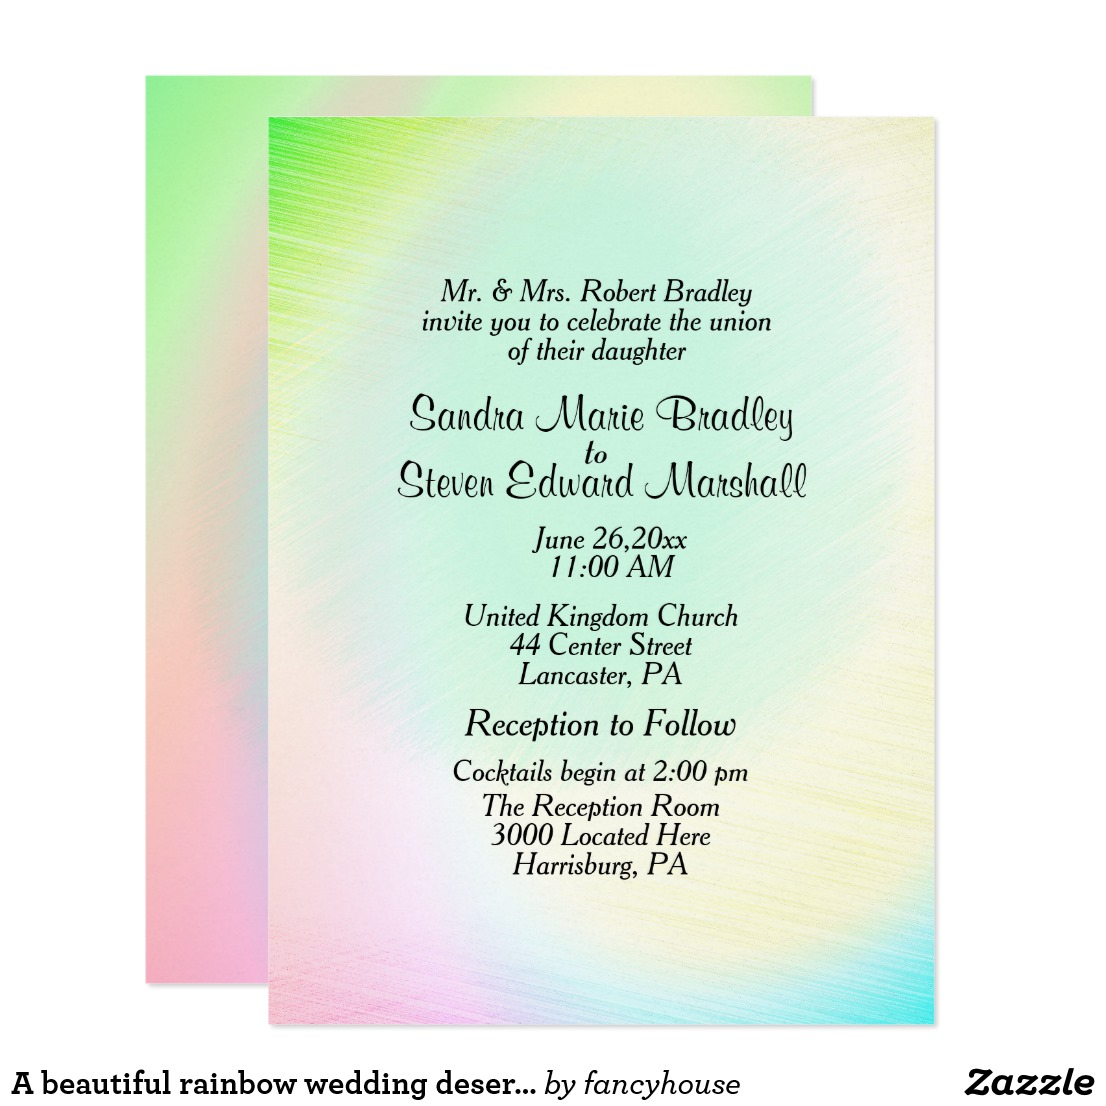 A beautiful rainbow wedding deserves these invitation